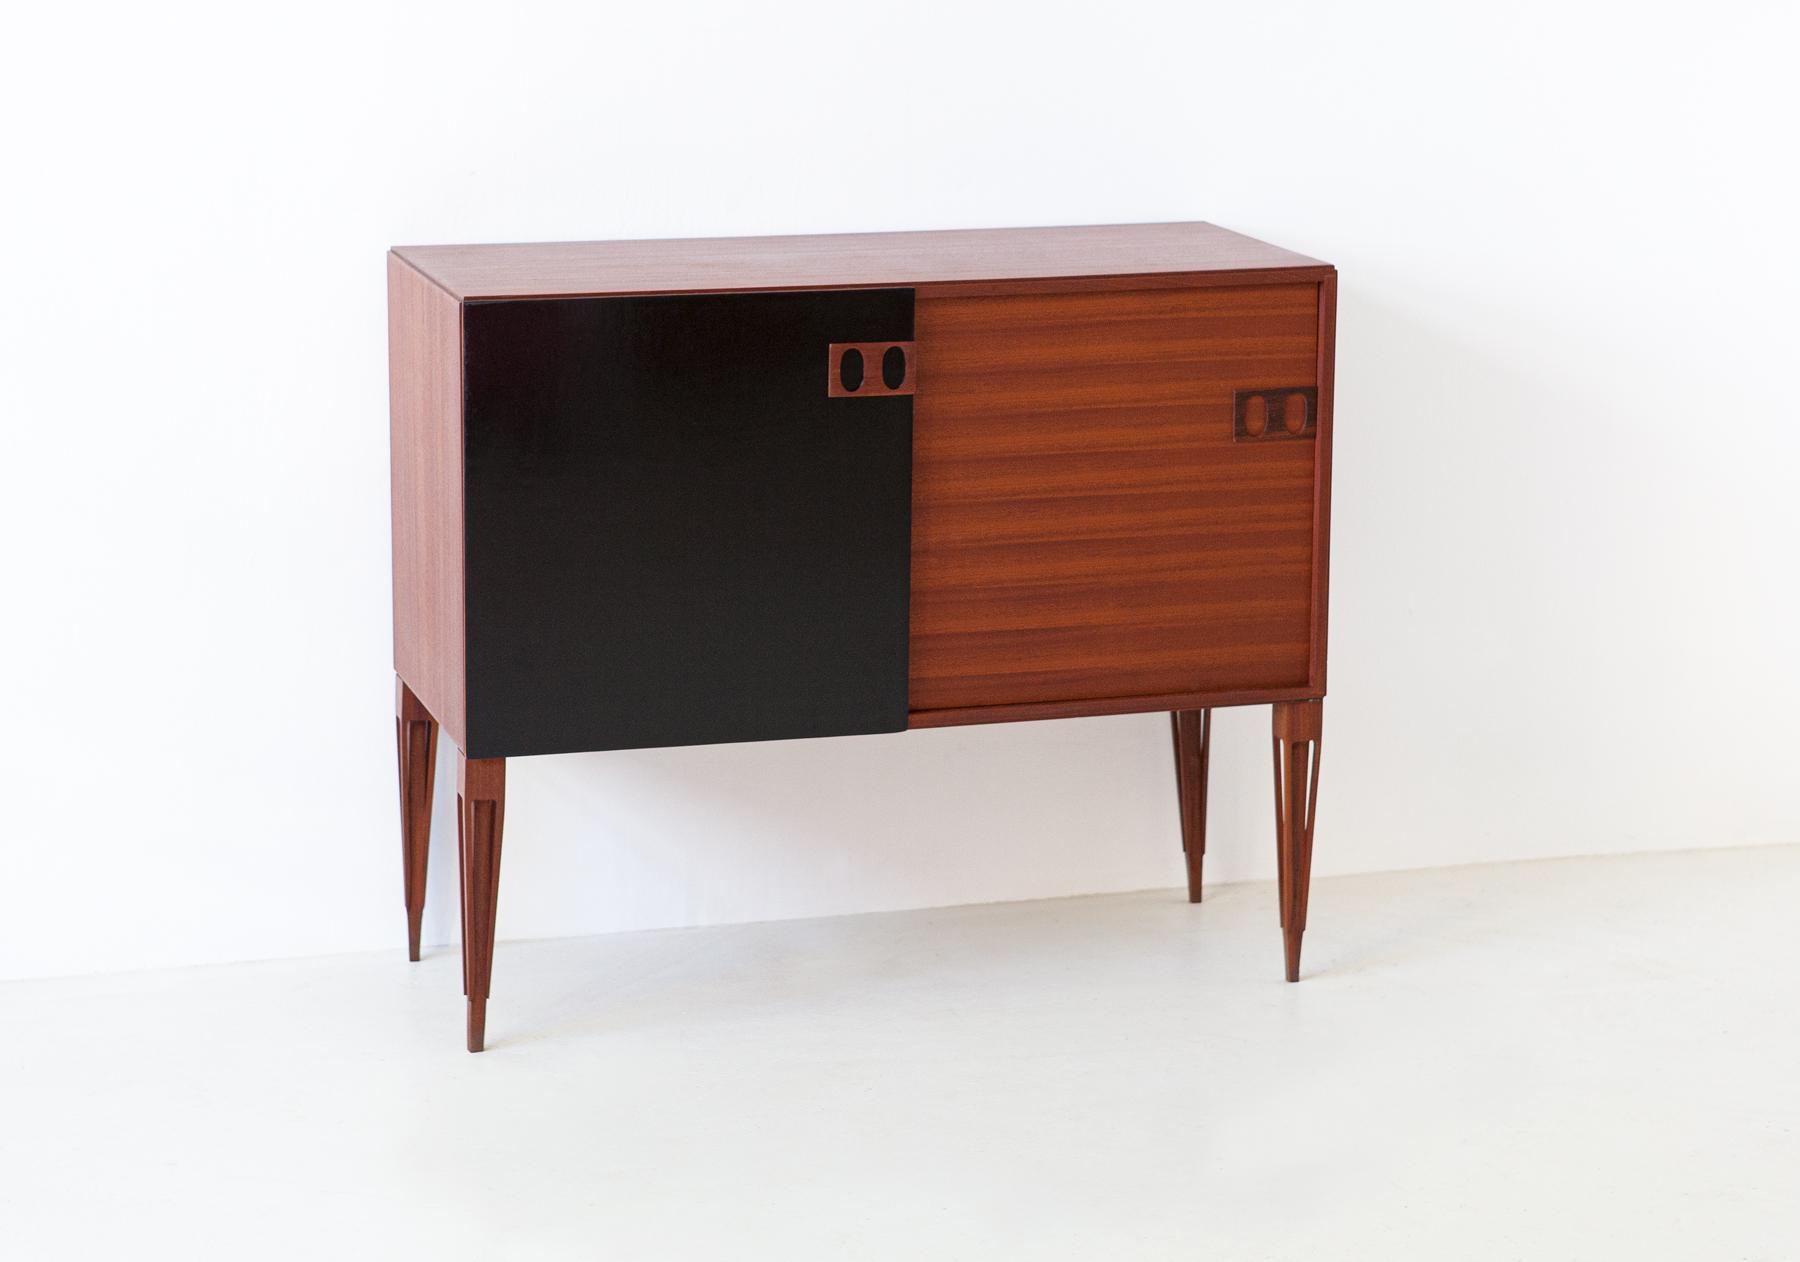 1950s-italian-mahogany-sideboard-by-fratelli-proserpio-9-st120